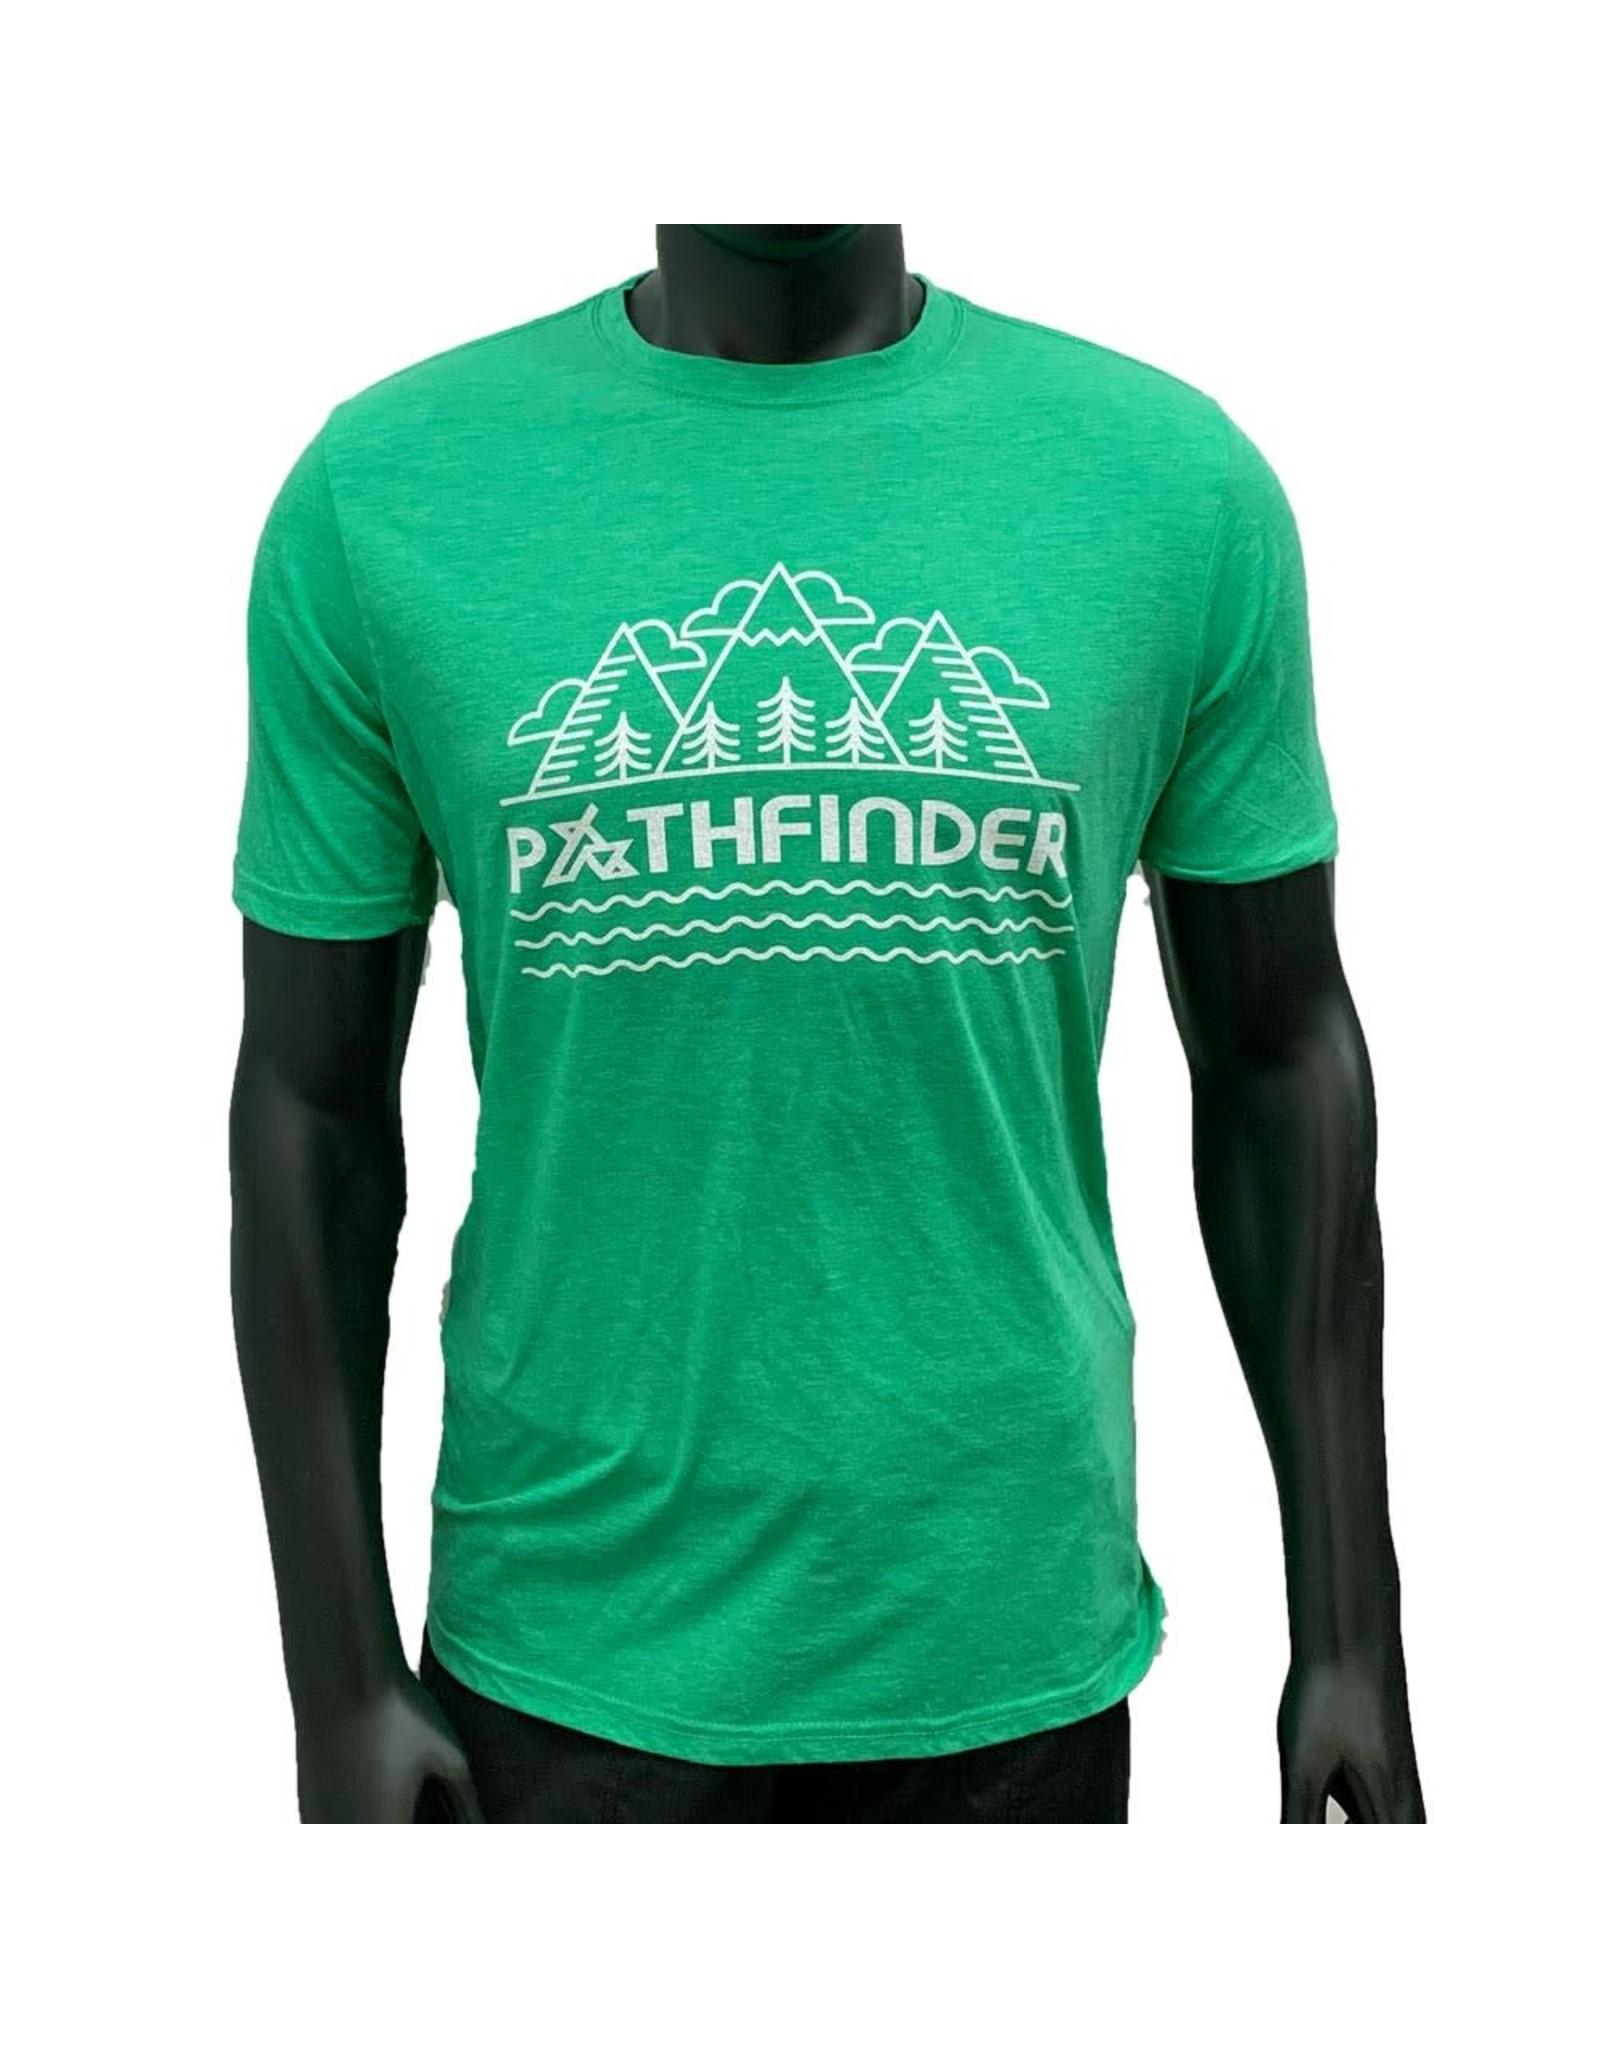 Pathfinder Linescape Crew Tee Envy/White